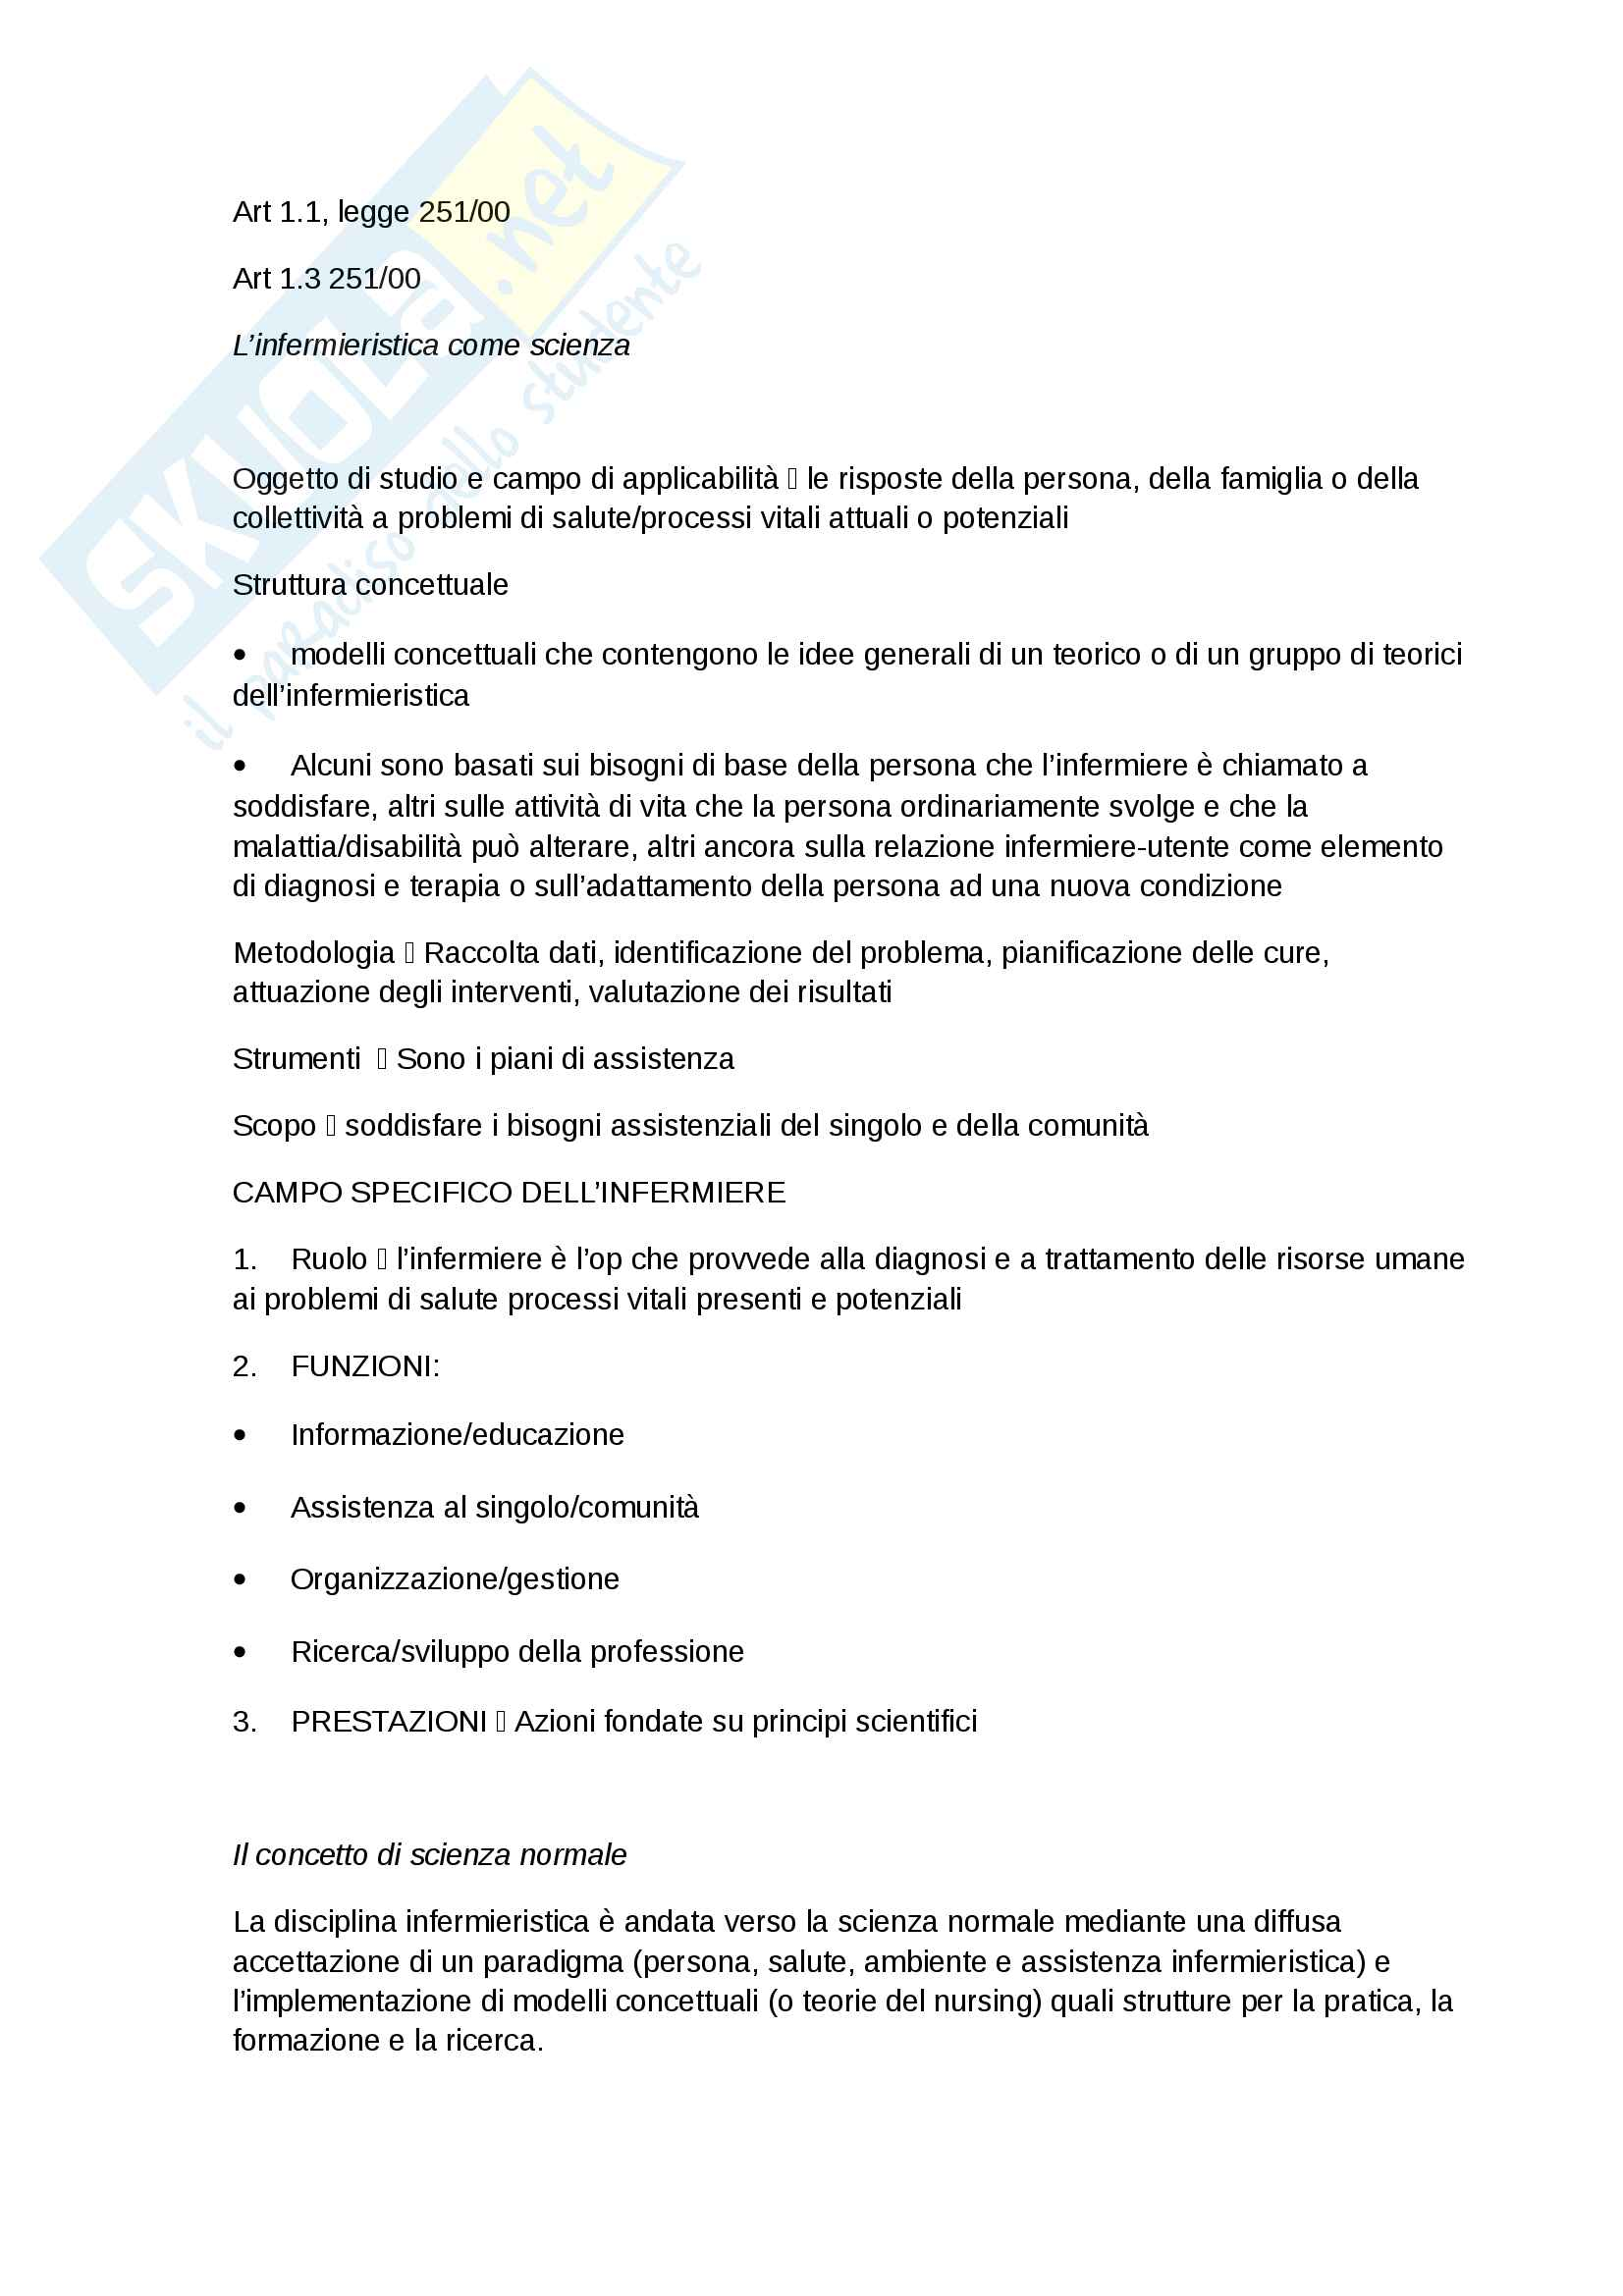 Teorie del nursing-Appunti Completi Pag. 6